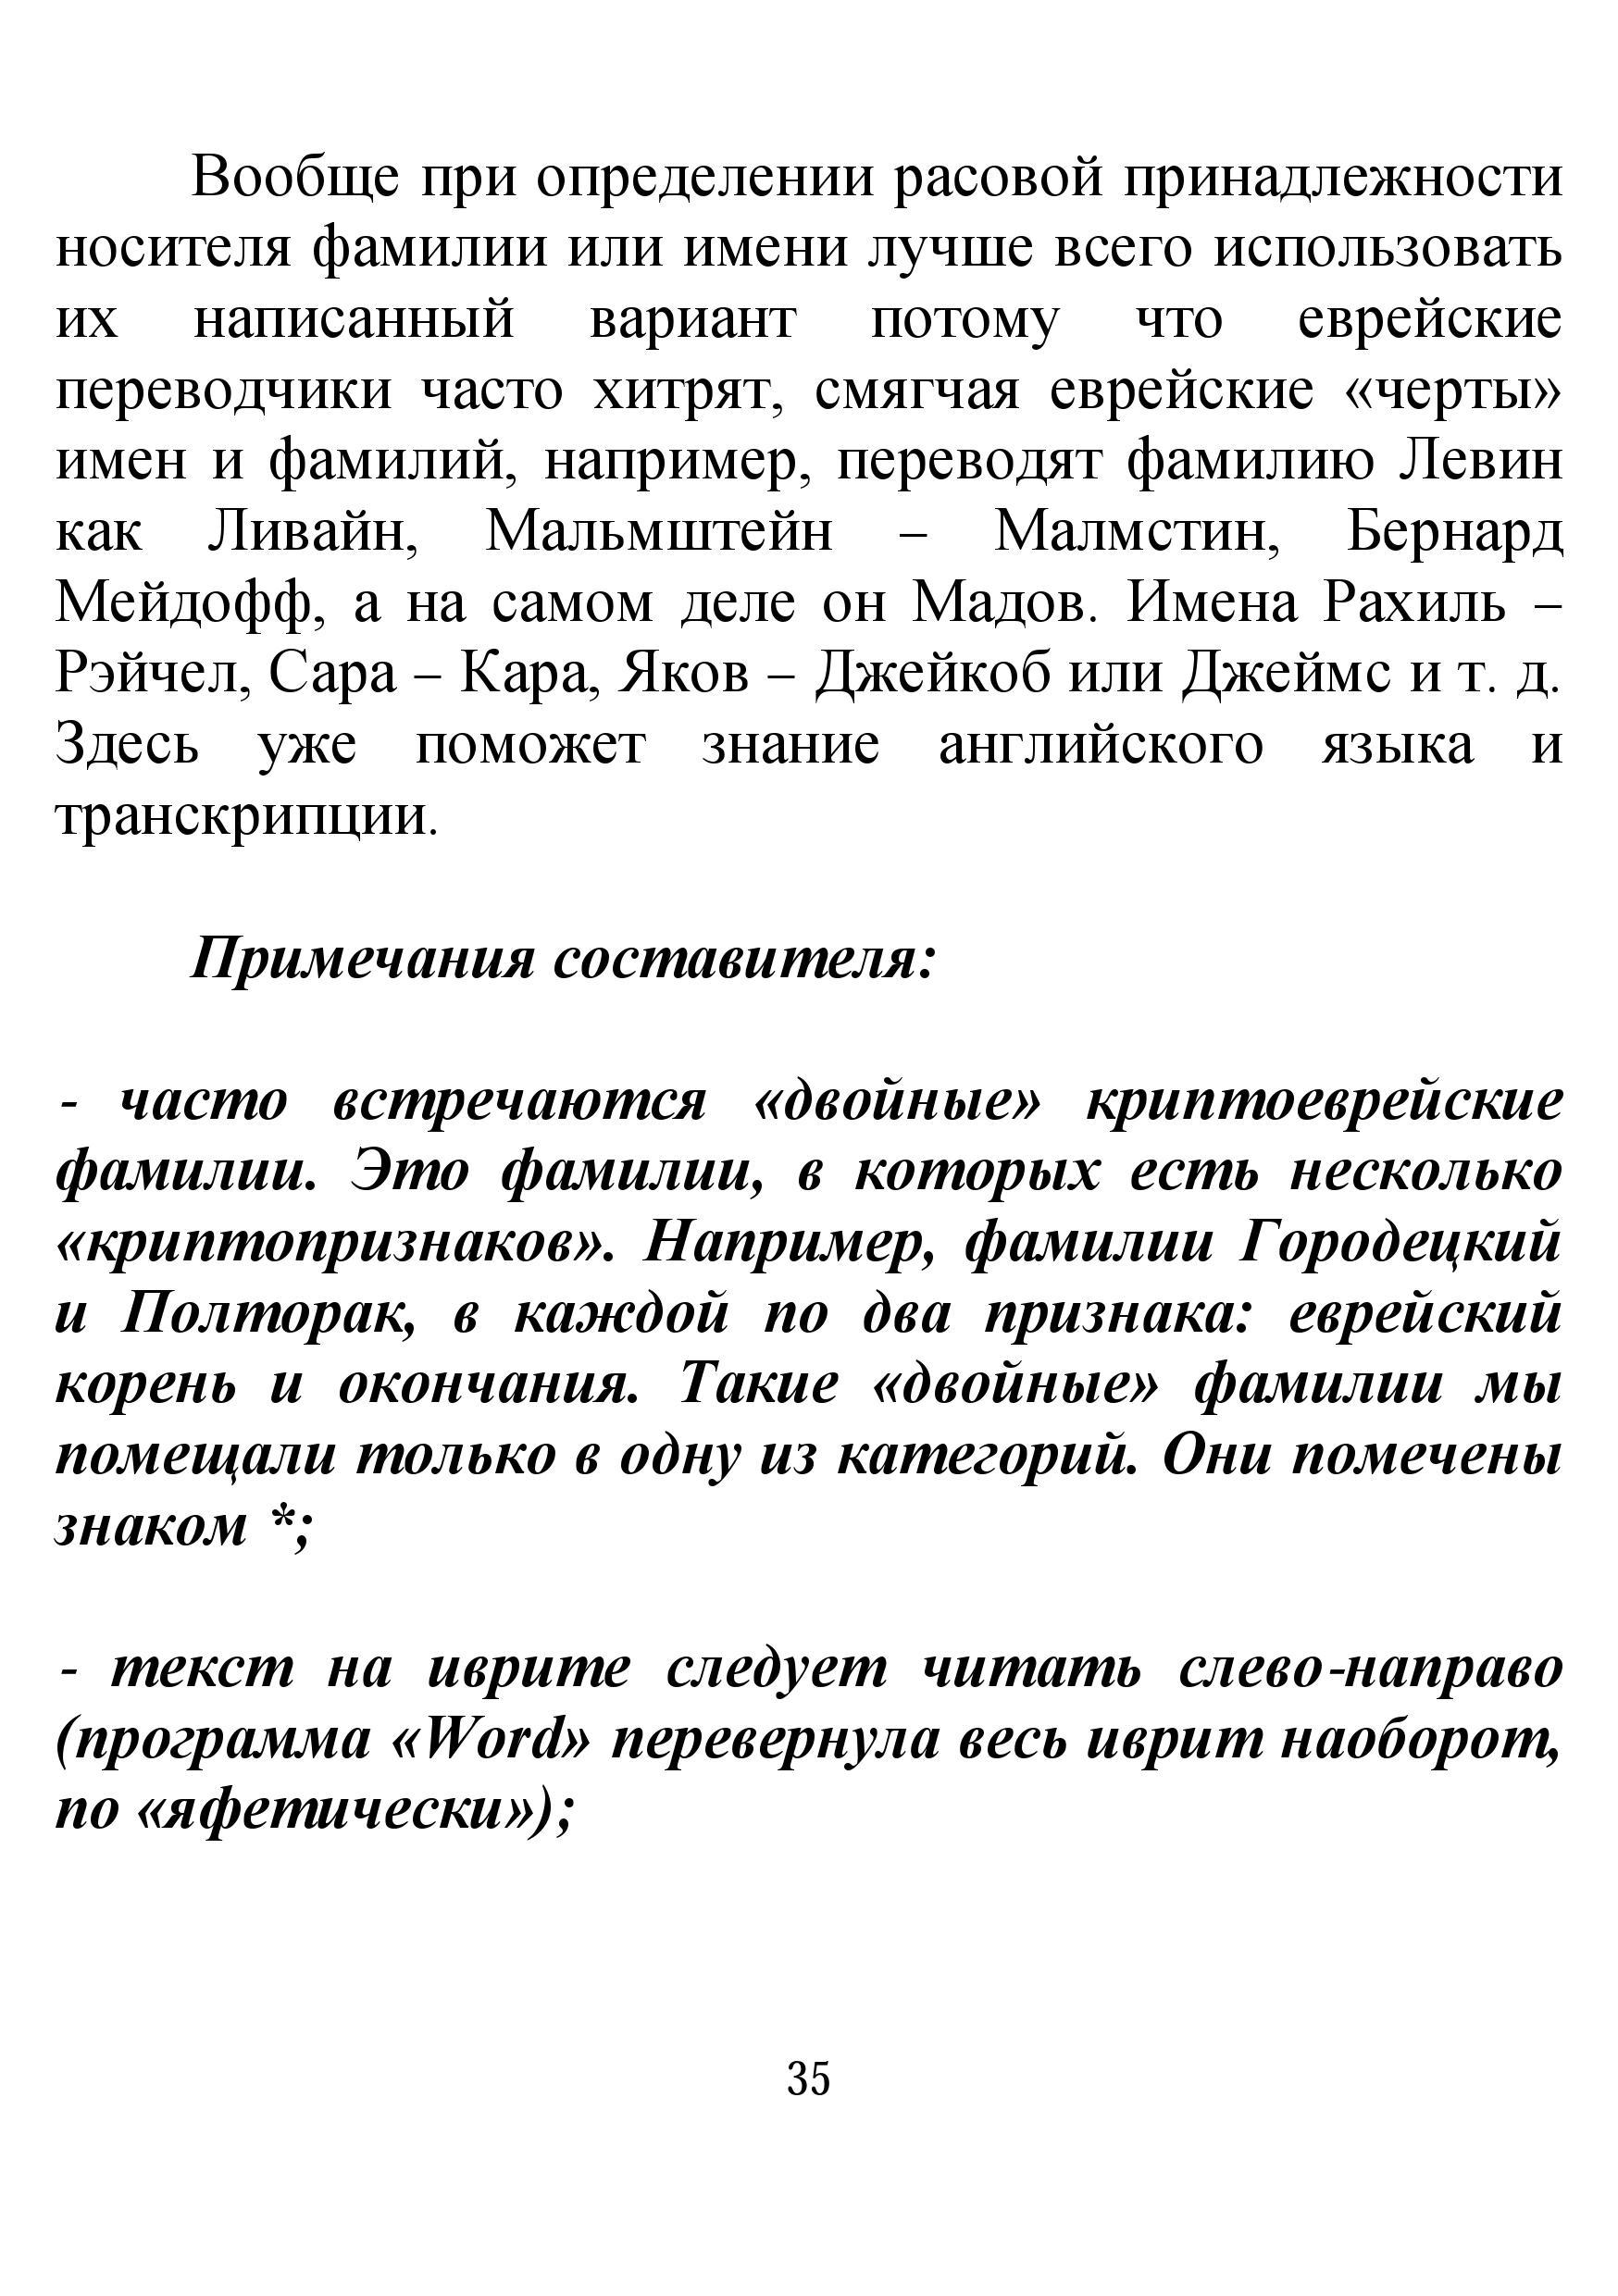 http://s4.uploads.ru/D1BgR.jpg